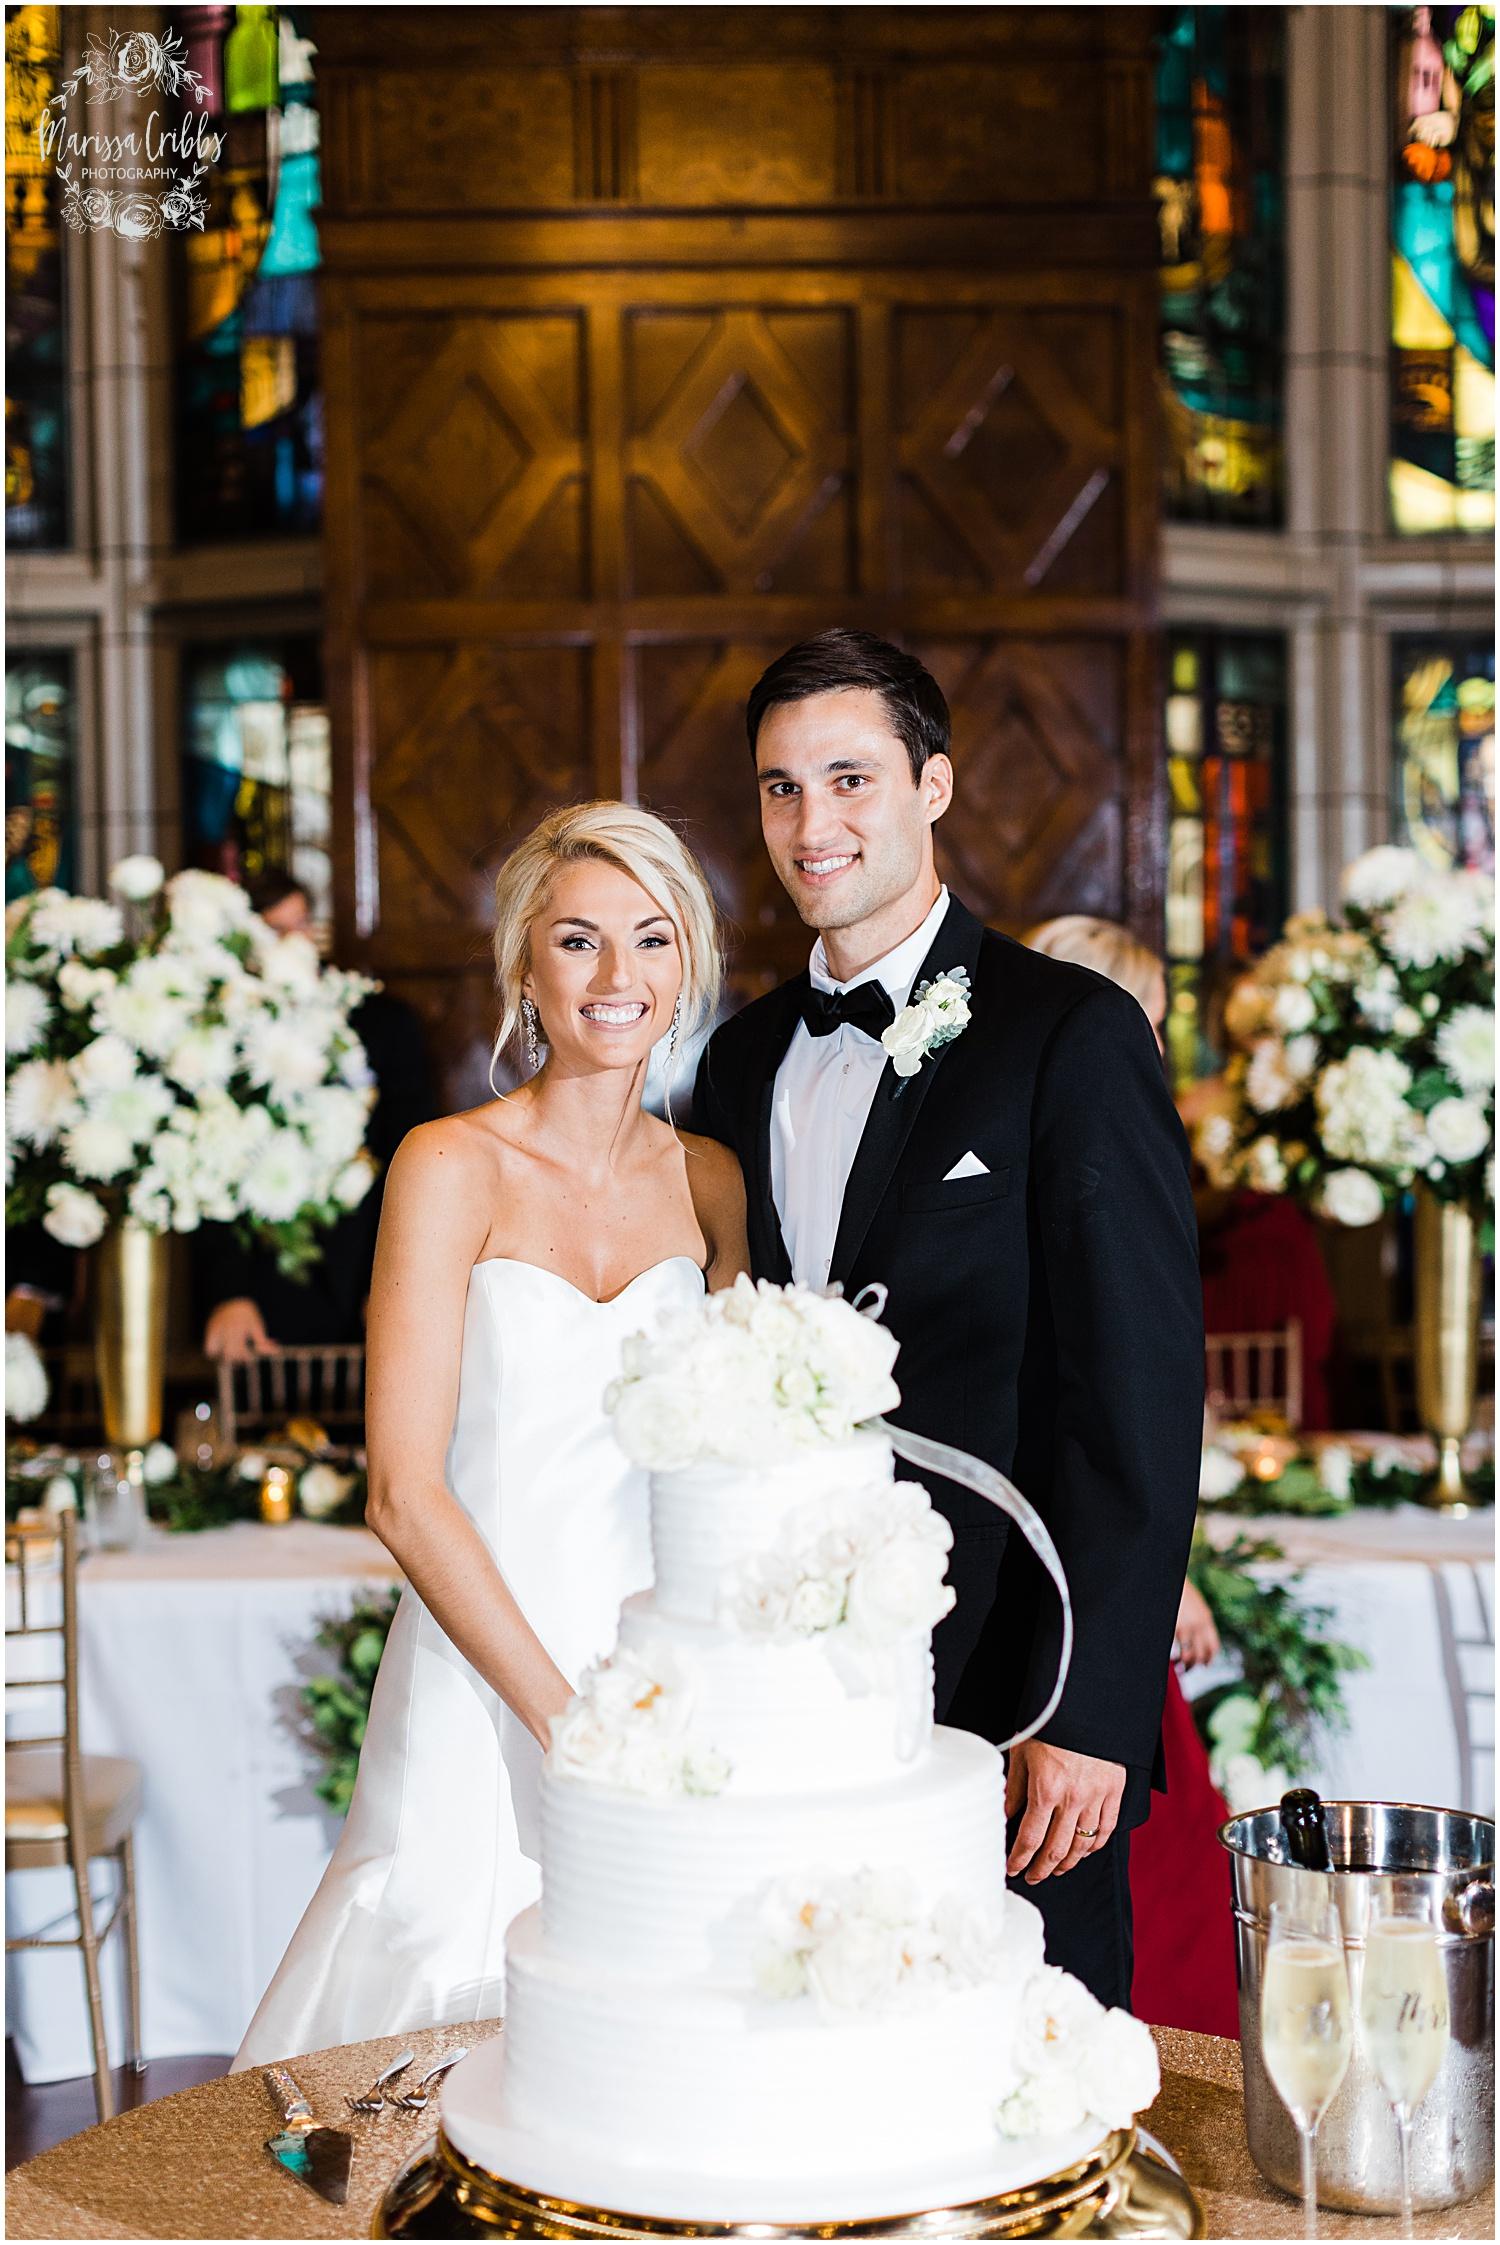 NOLL WEDDING | THE BRASS ON BALTIMORE | MARISSA CRIBBS PHOTOGRAPHY_6358.jpg